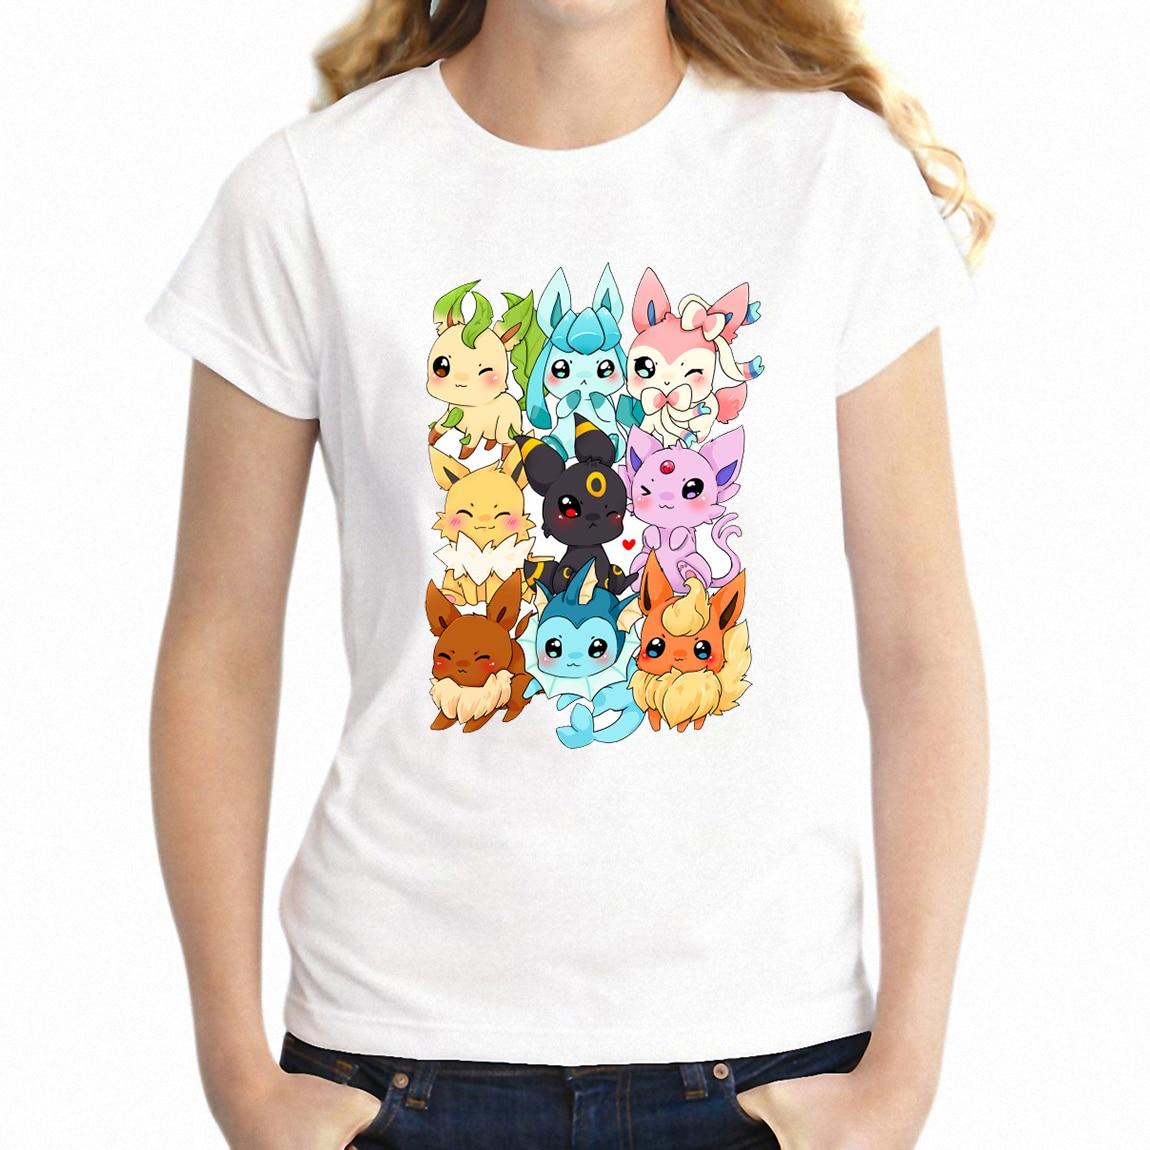 New Women's T-shirt Eevee Evolution Pokemon Gamer Girl's Short Sleeve Tshirt Harajuku Hip Hop Tees Tops